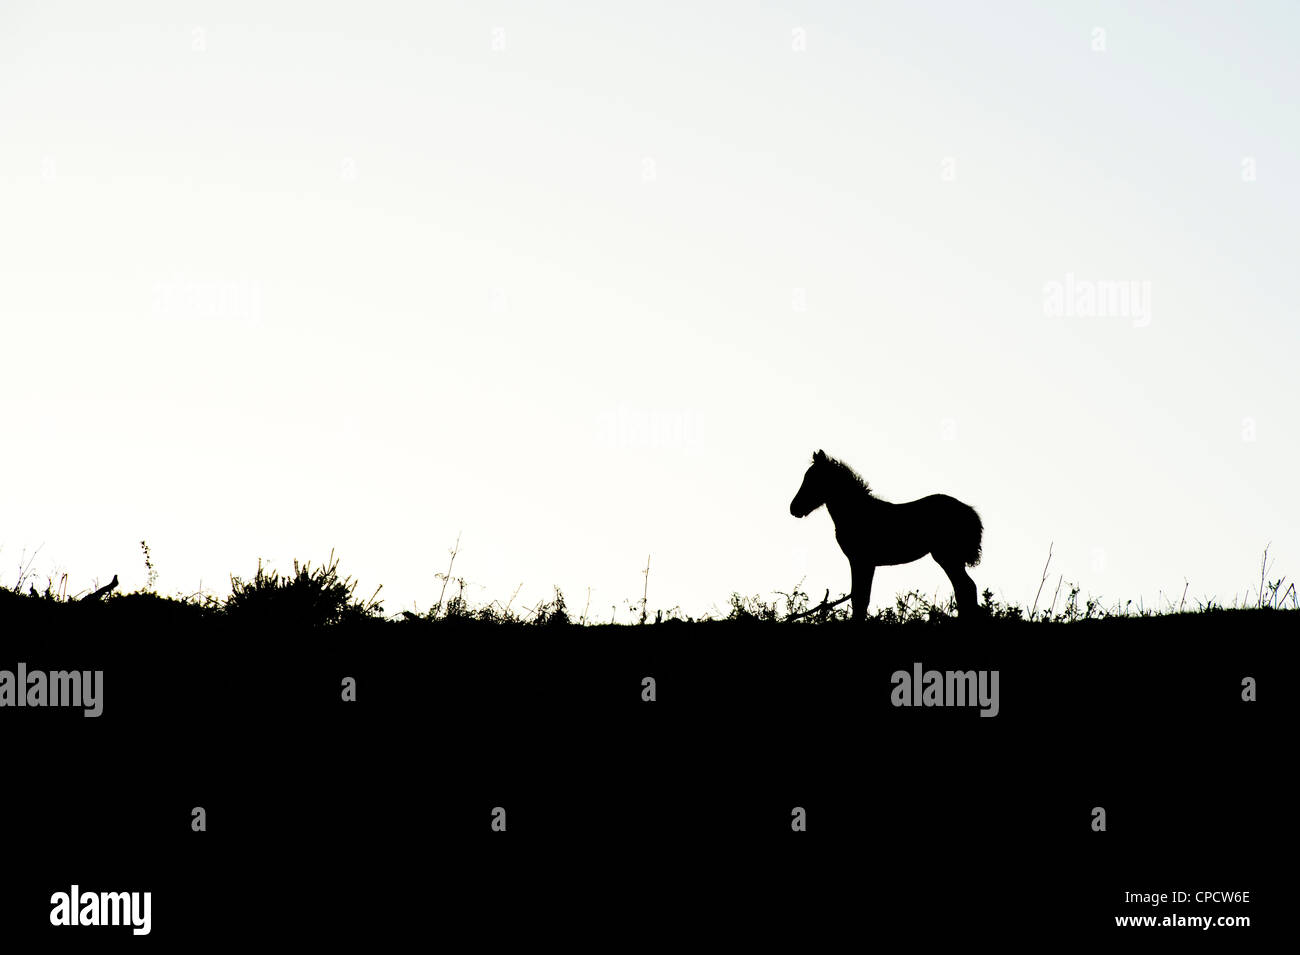 Dartmoor pony / foal silhouette . Dartmoor national park, Devon, England Stock Photo